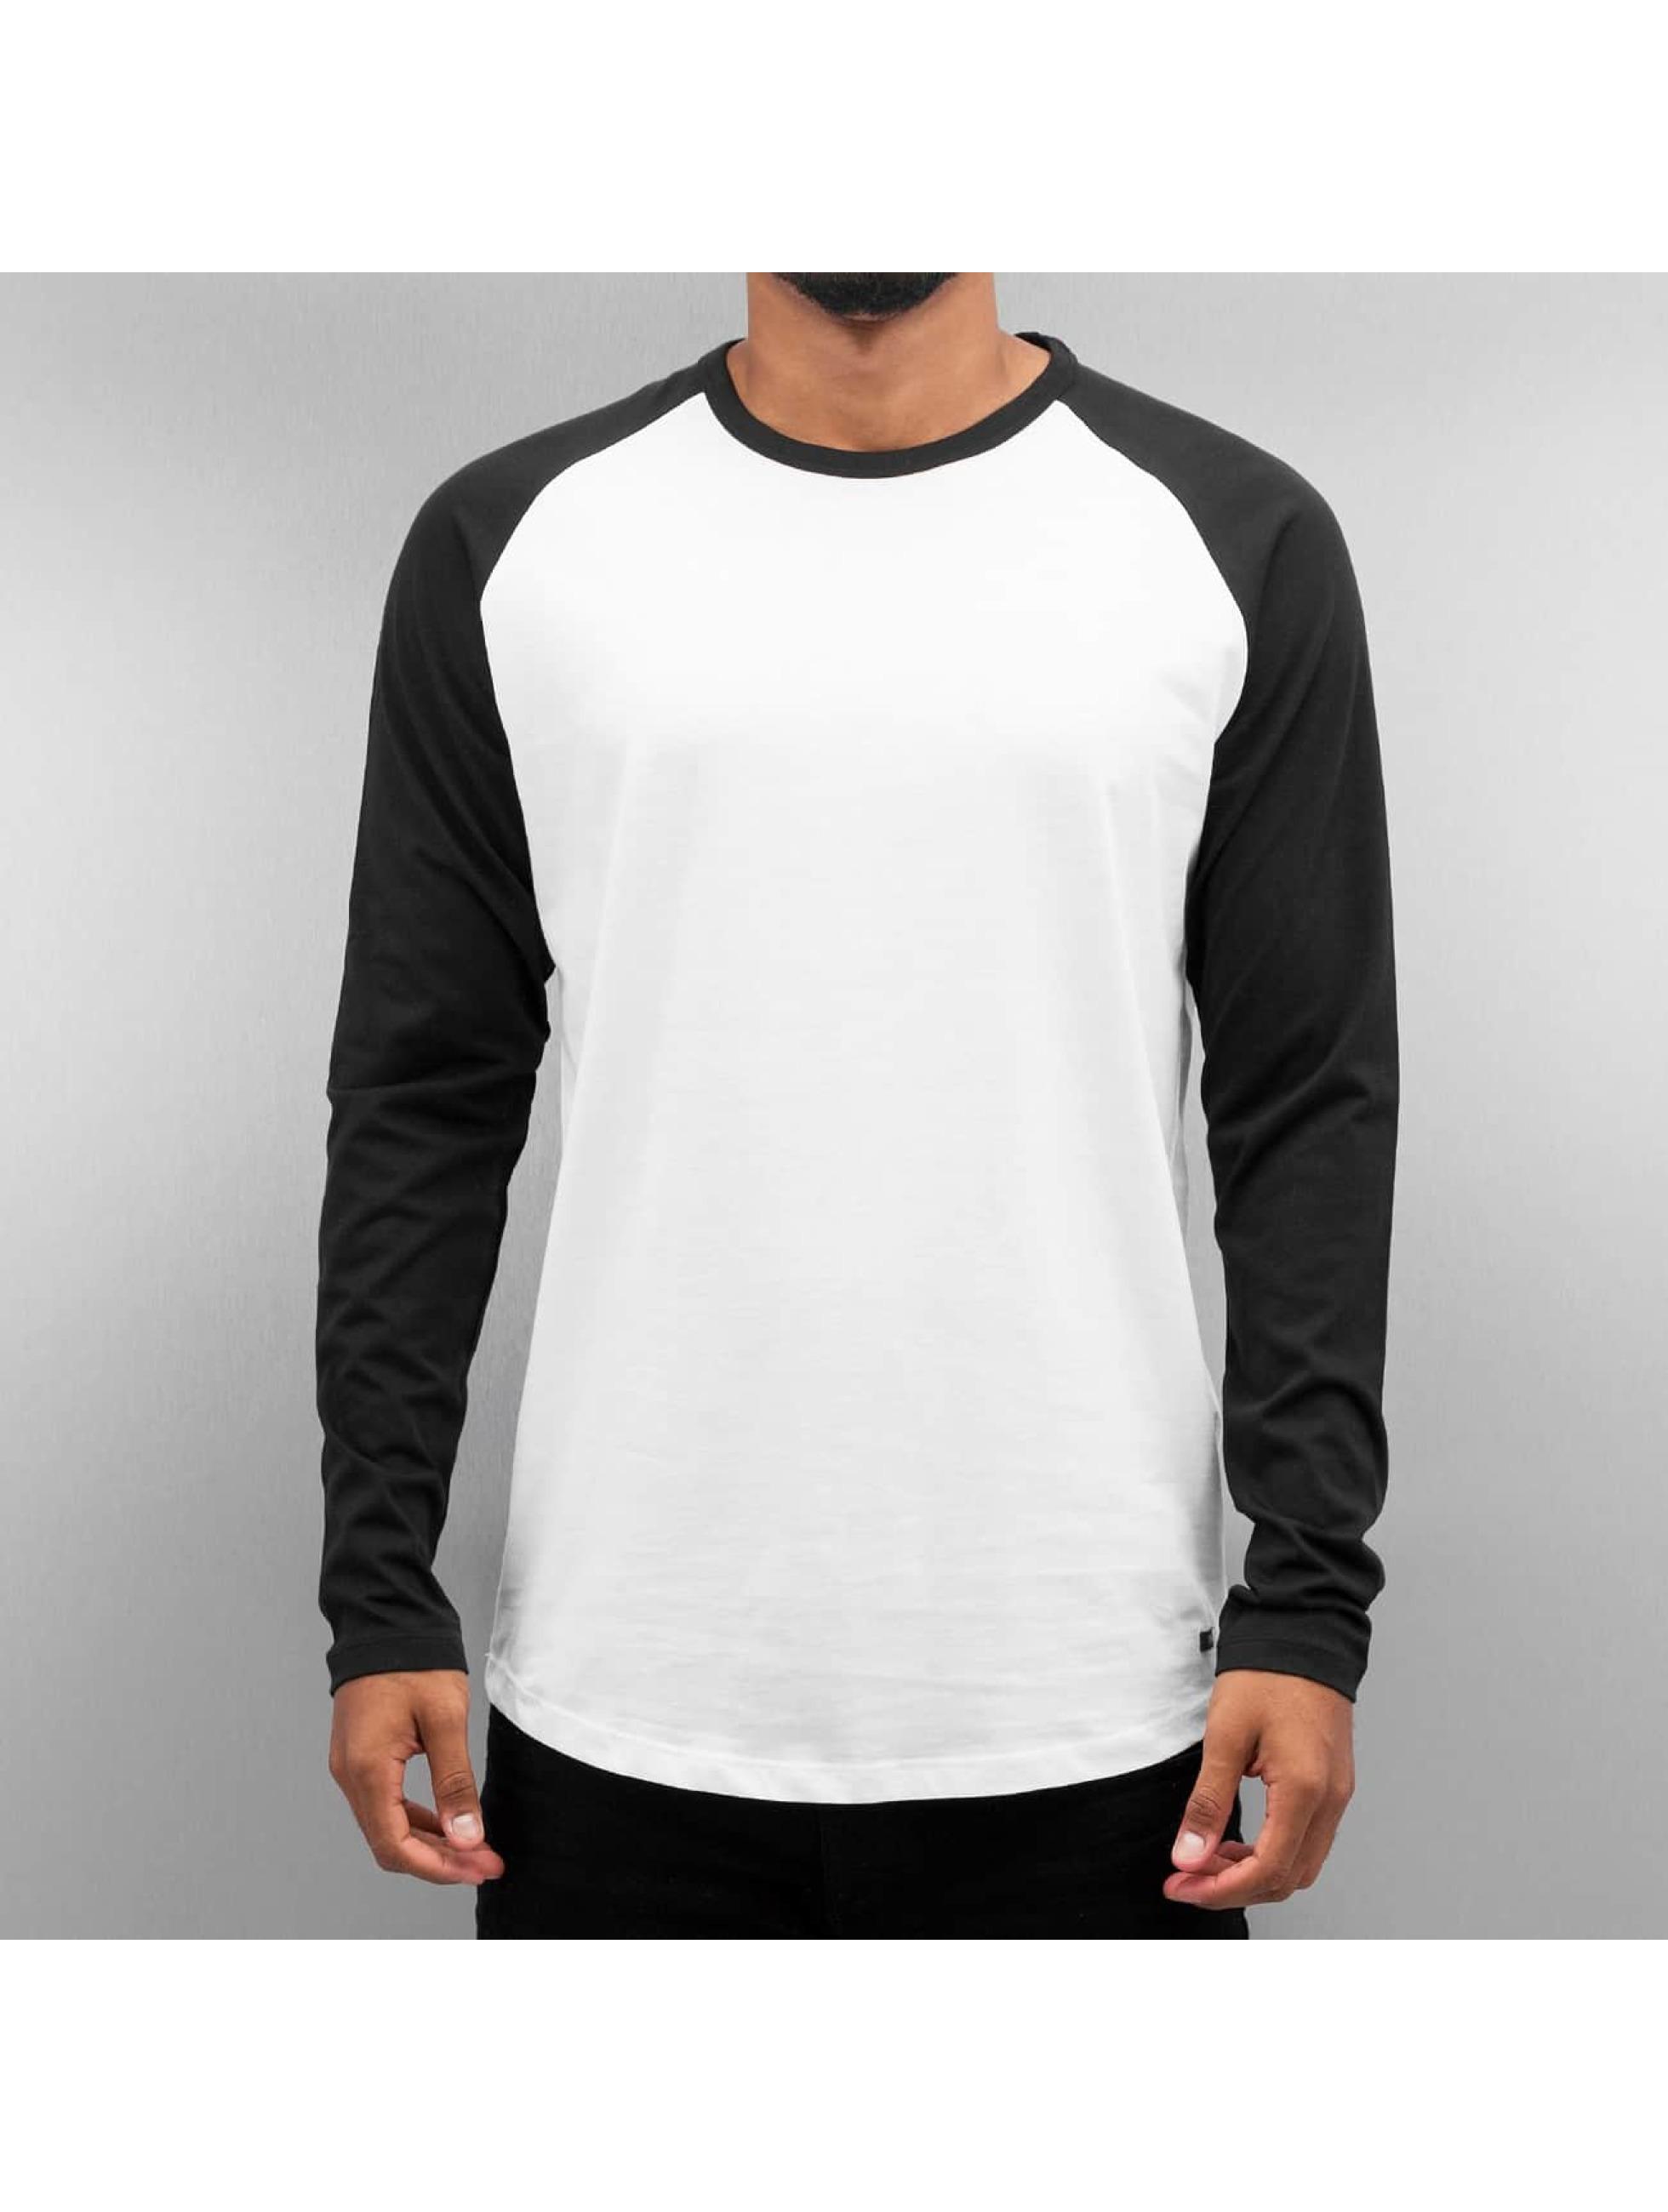 Jack   Jones Haut   T-Shirt manches longues jjorStan en blanc 293058 53e4909bd1fc